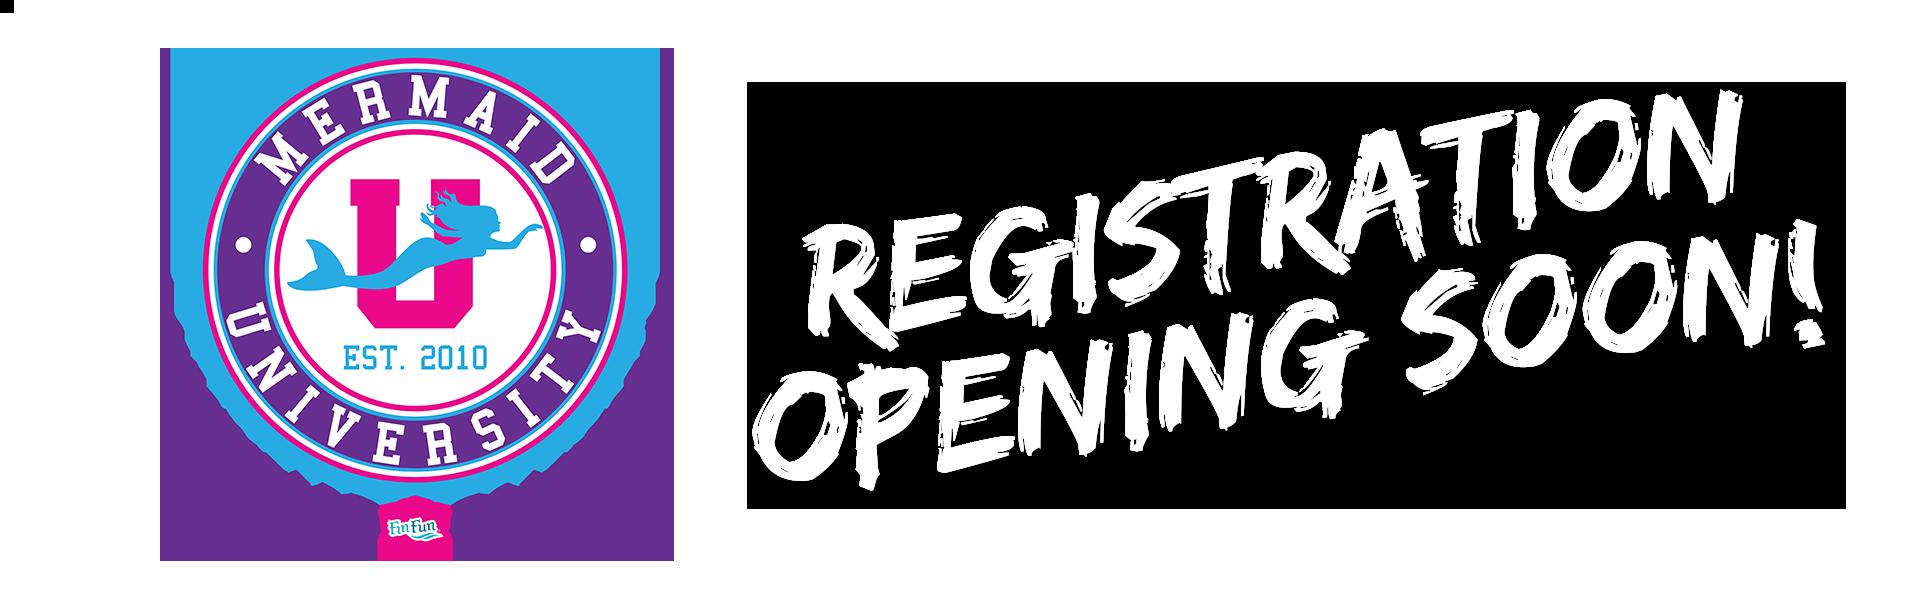 registration opening soon web banner.png